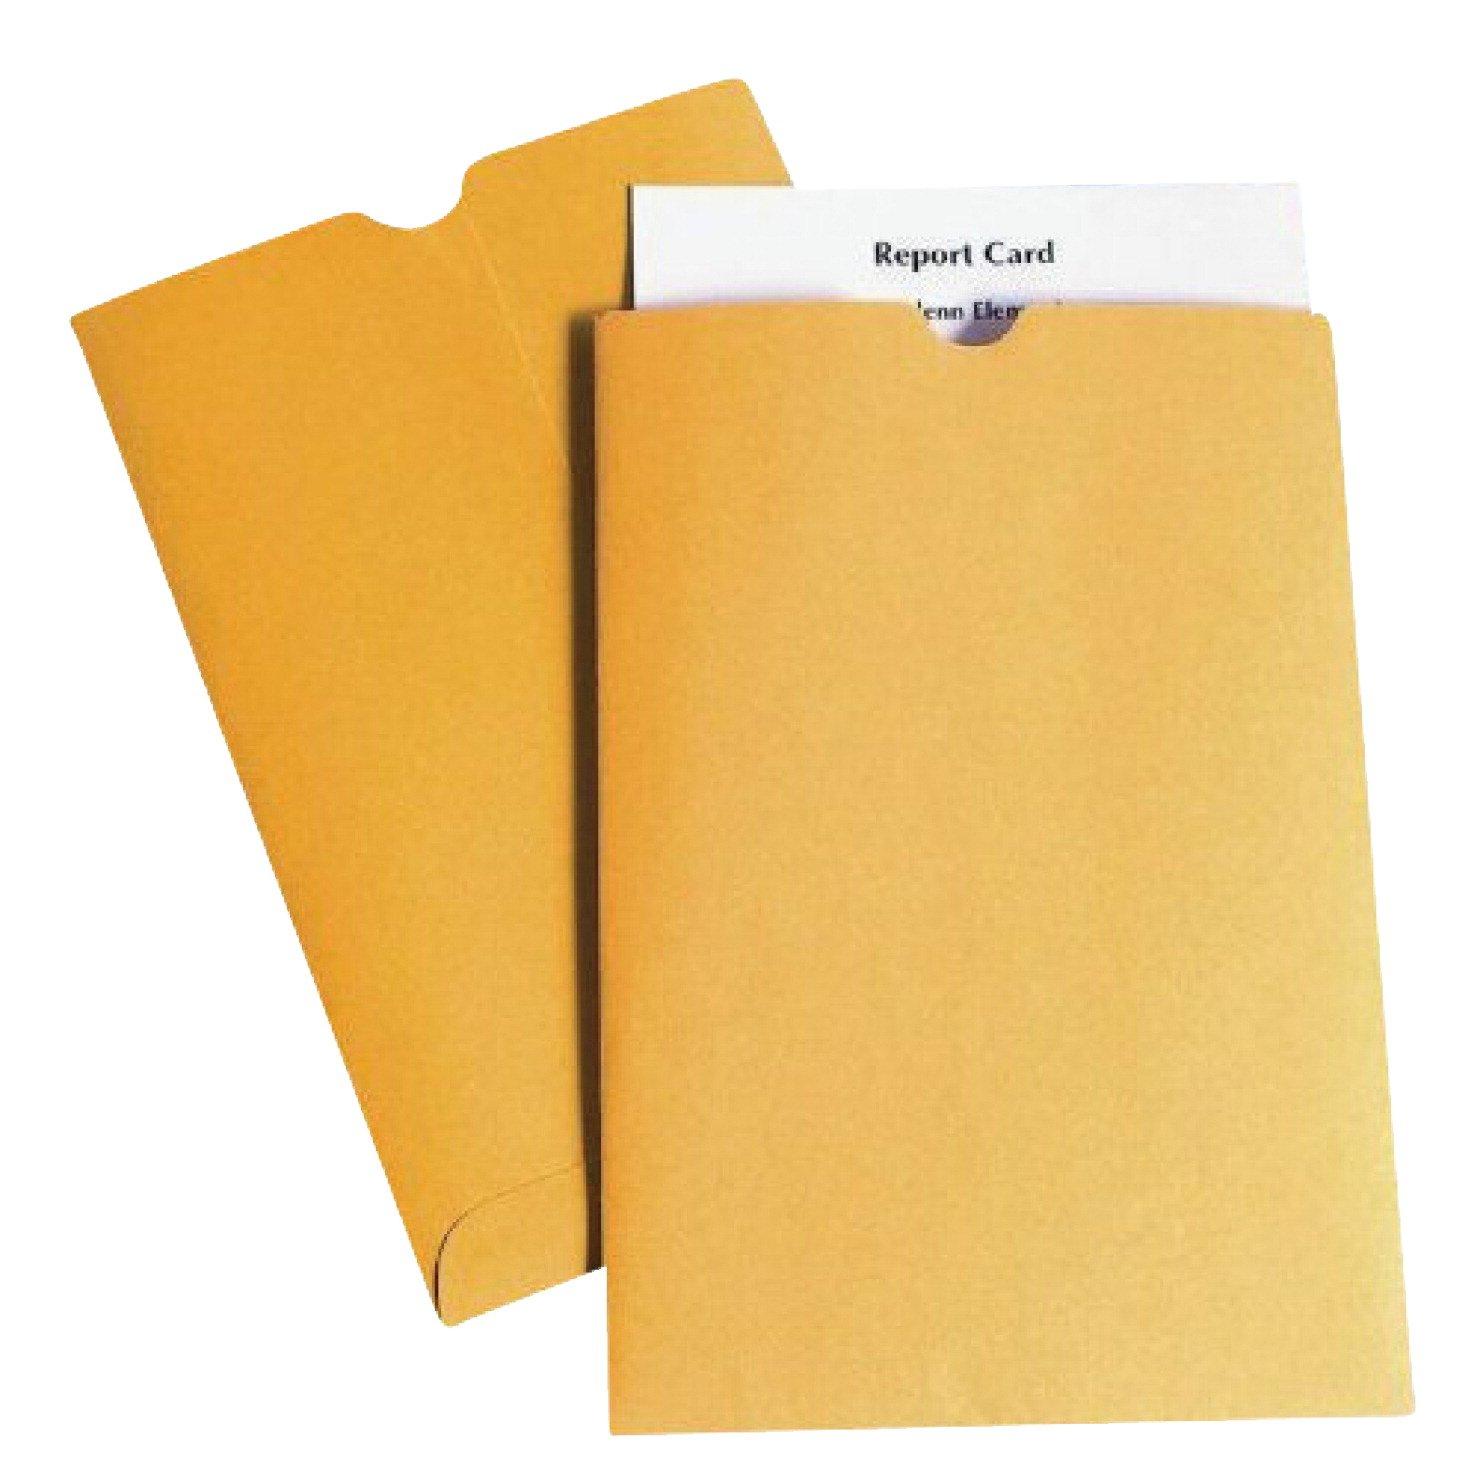 School Smart 85060 Report Card Envelopes -6 x 9 - Pack of 500